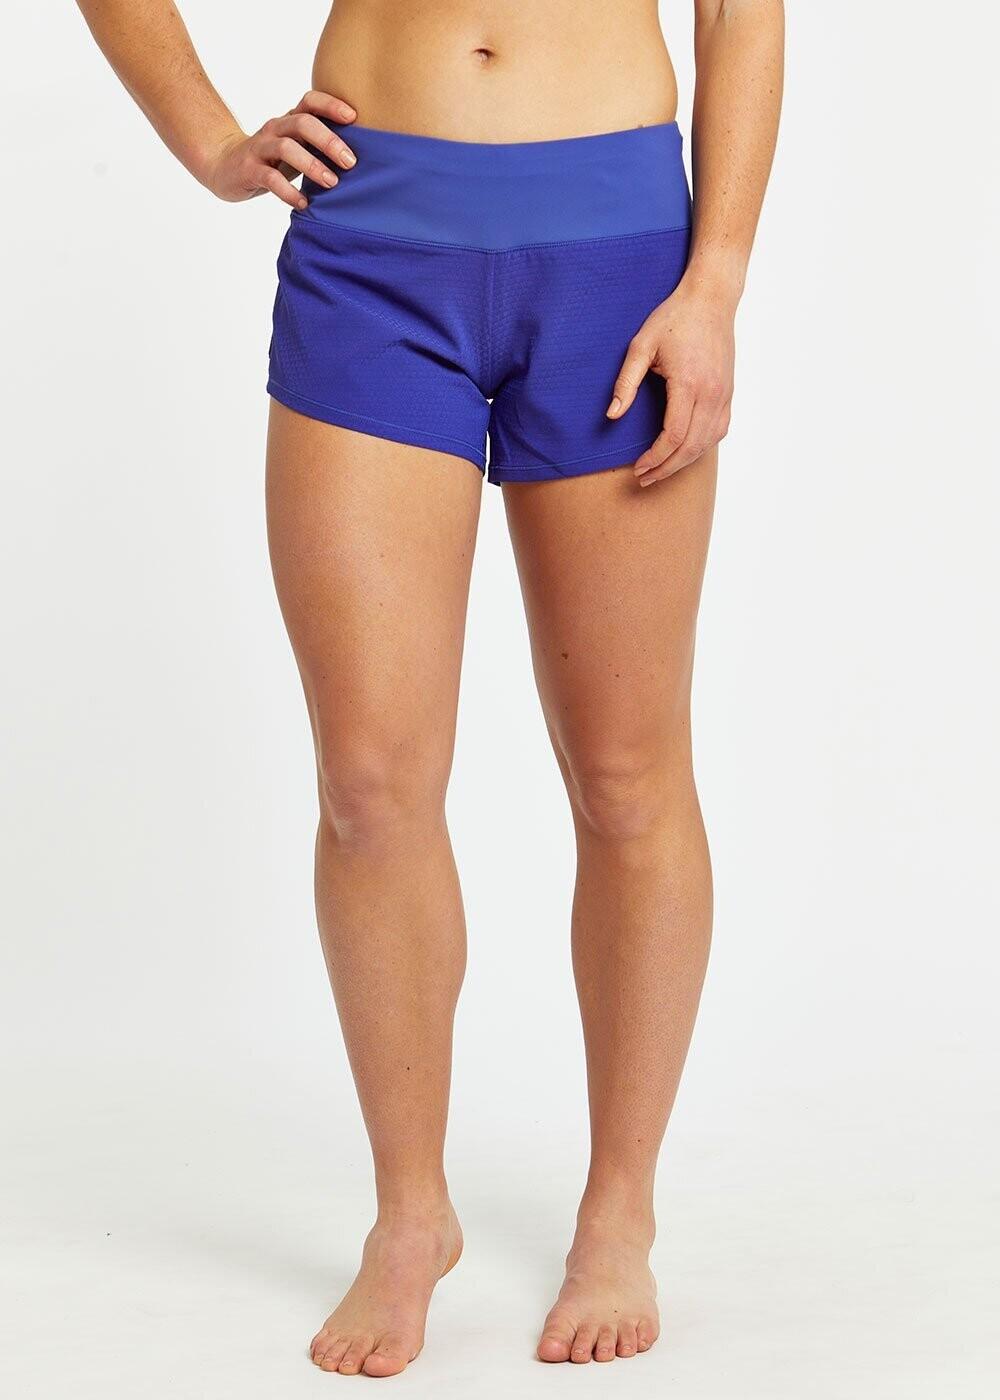 Oiselle, Roga Shorts, Lapis